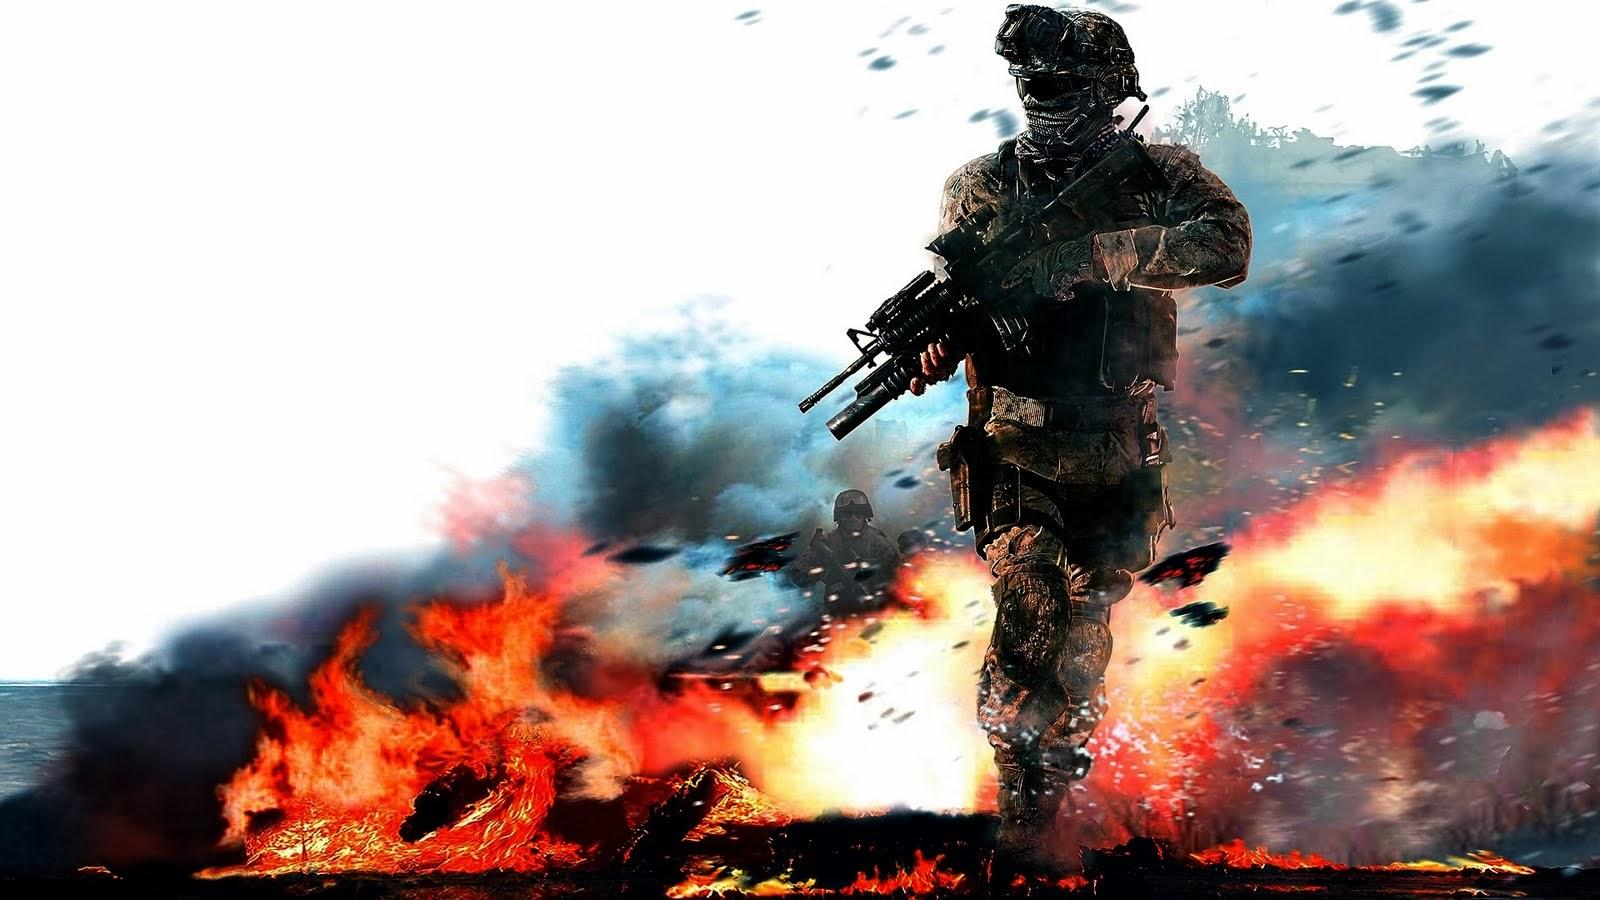 call of duty 1 wallpaper-#main